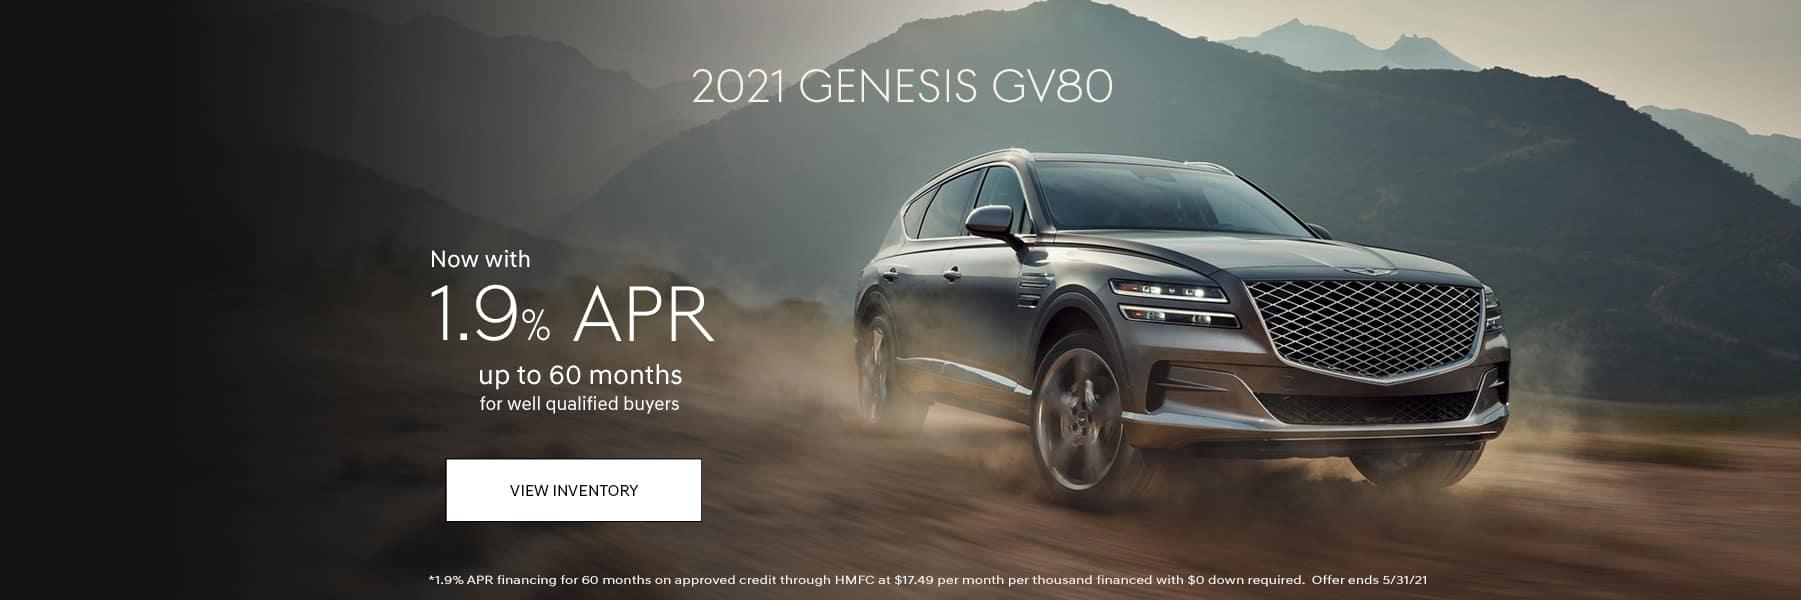 2021-Genesis-GV80-May21